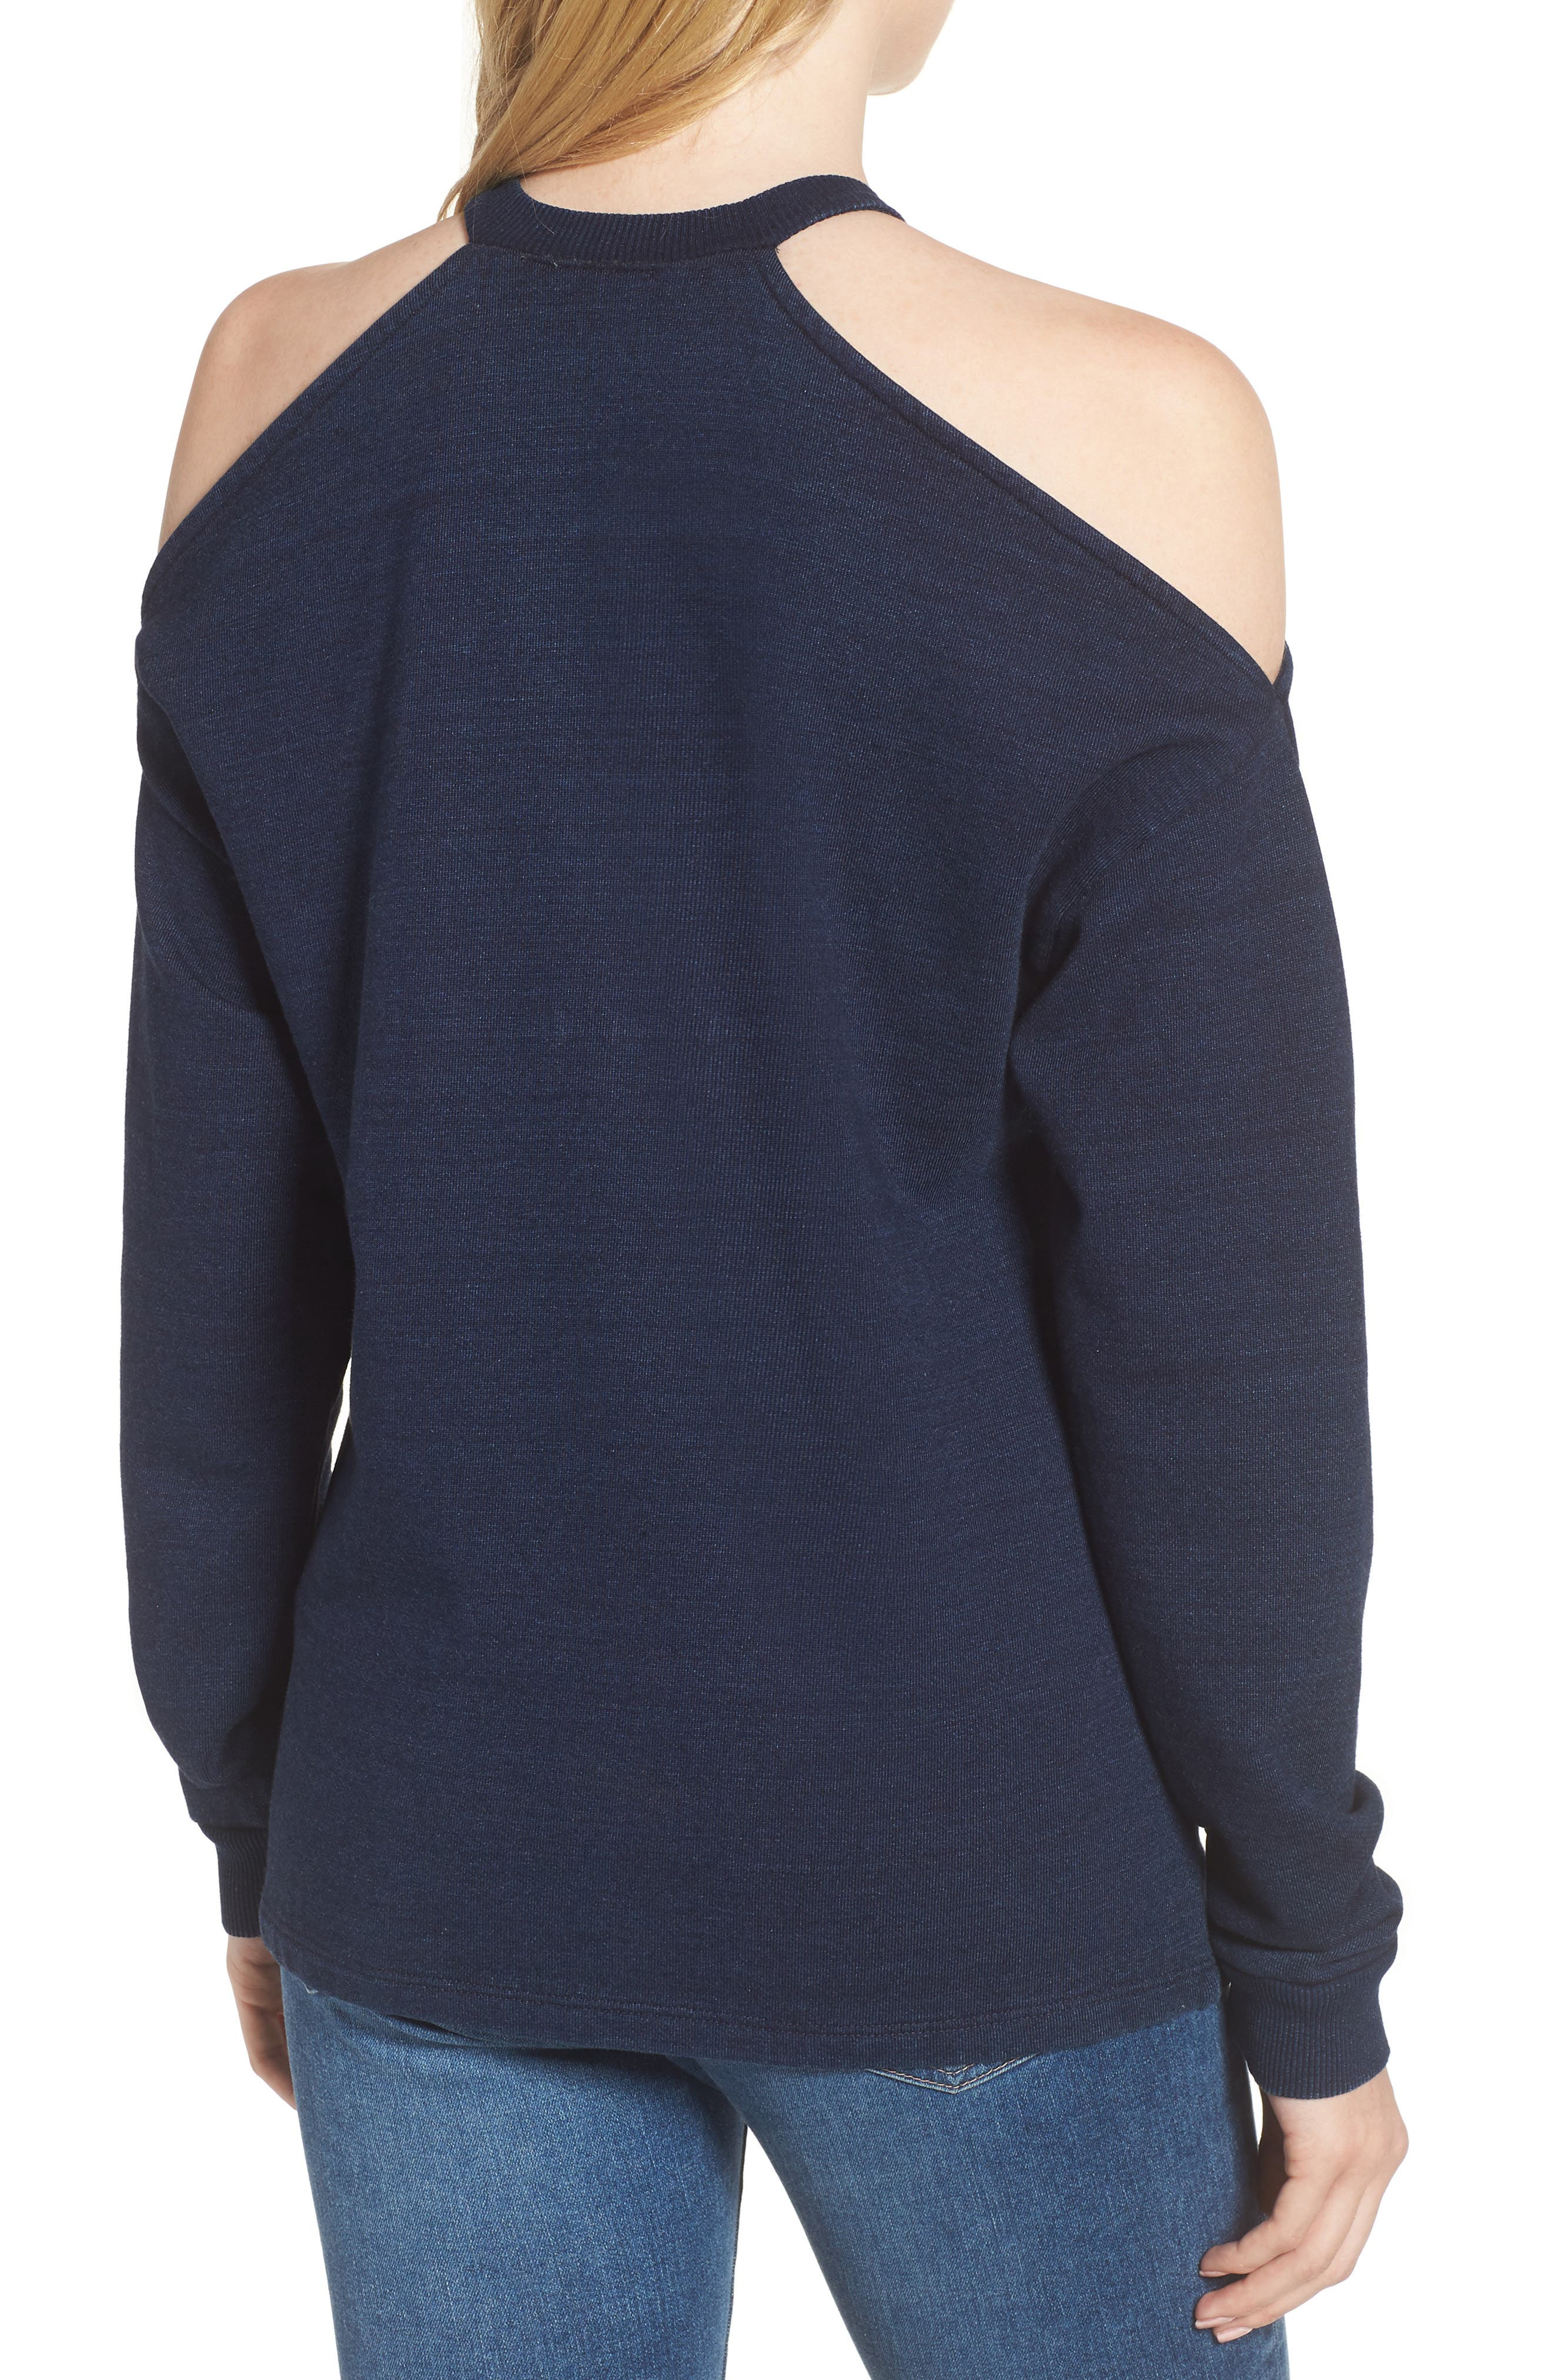 Gizi Cold Shoulder Sweatshirt,                             Alternate thumbnail 2, color,